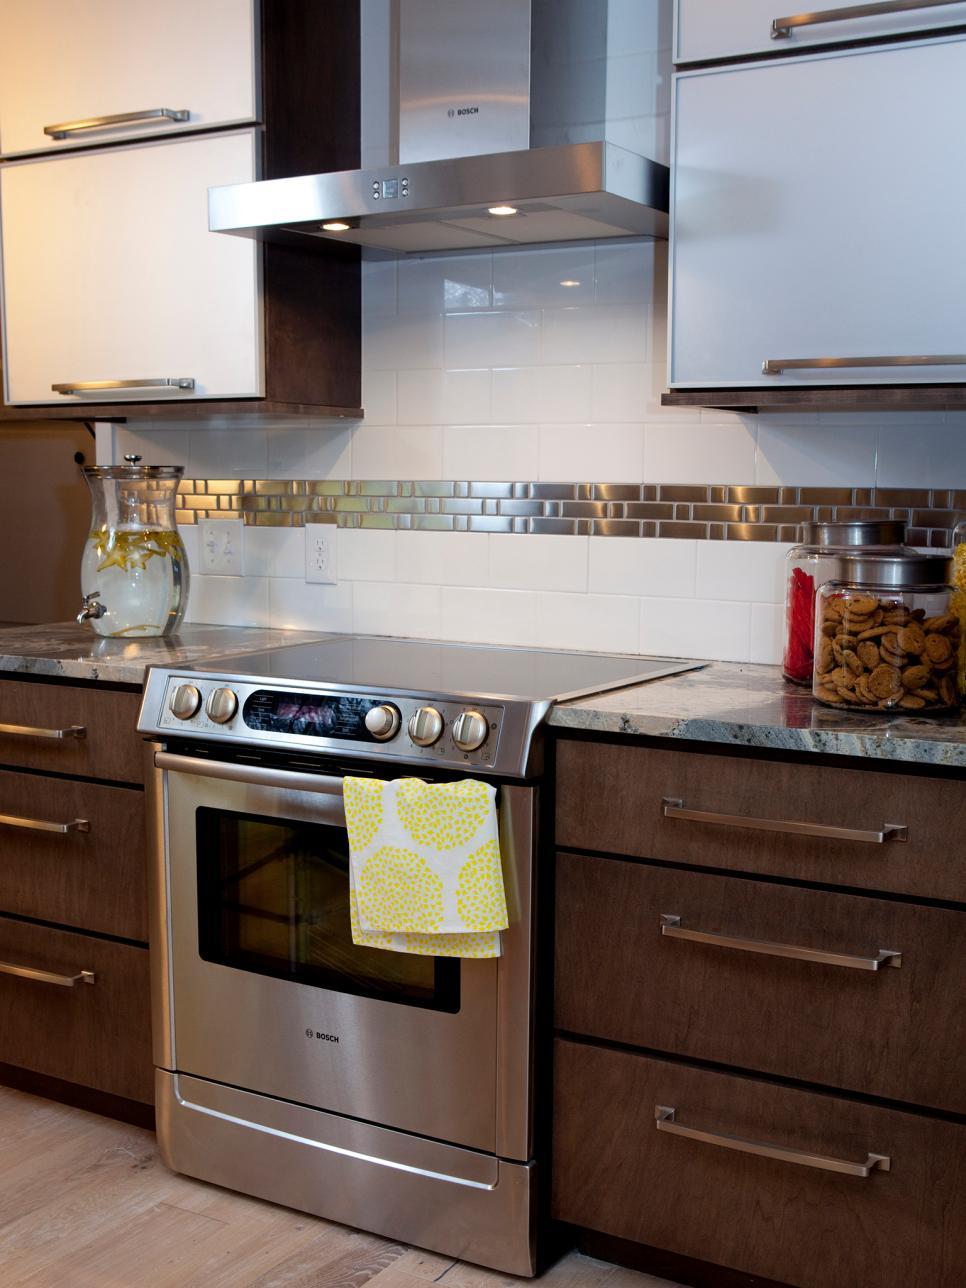 Kitchen Stove Backsplash Ideas Pictures Tips From Hgtv: 11 Creative Subway Tile Backsplash Ideas